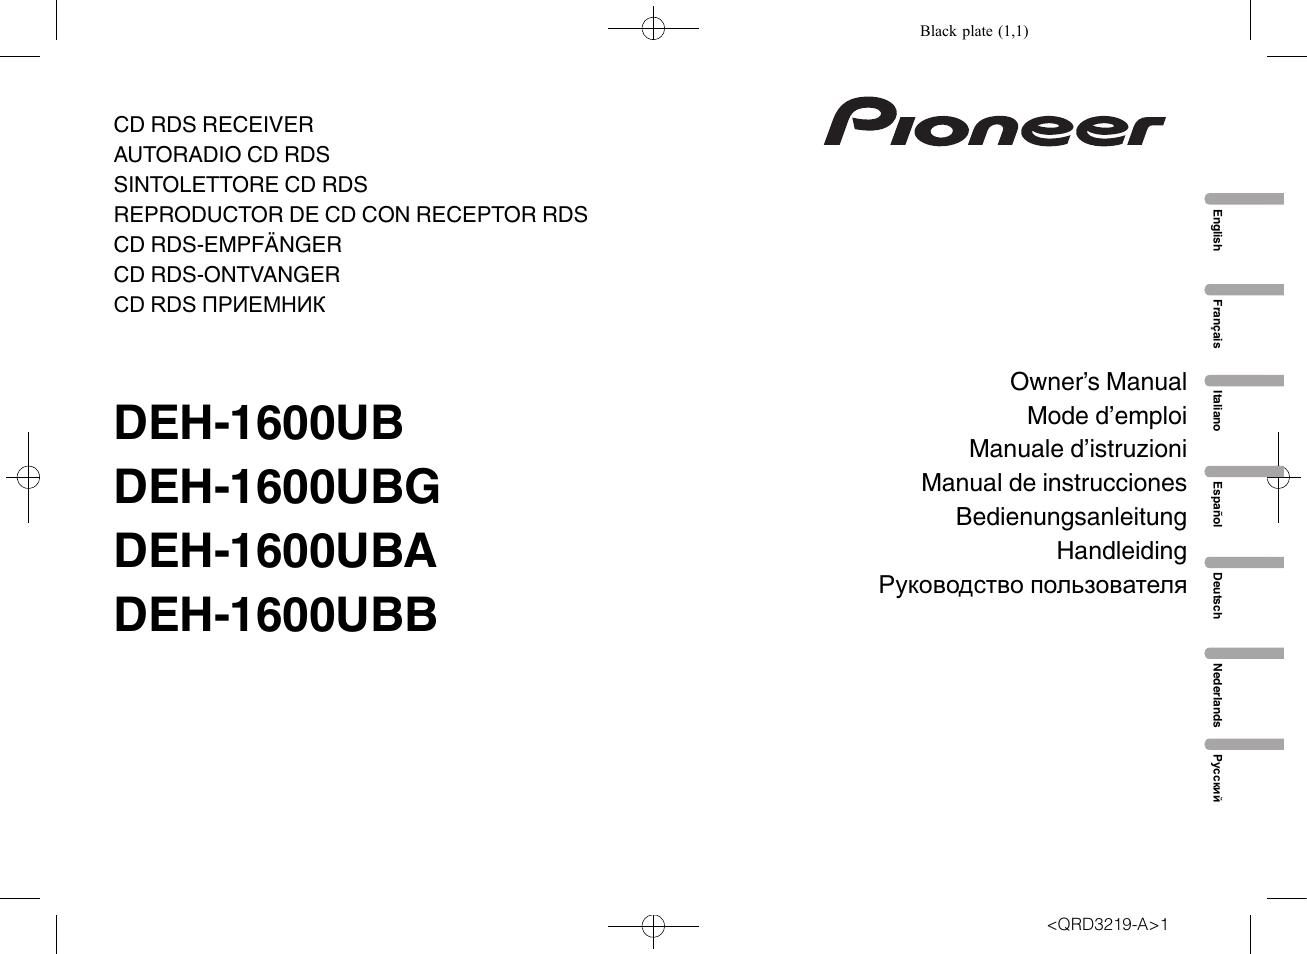 Pioneer deh-1600ubg инструкция